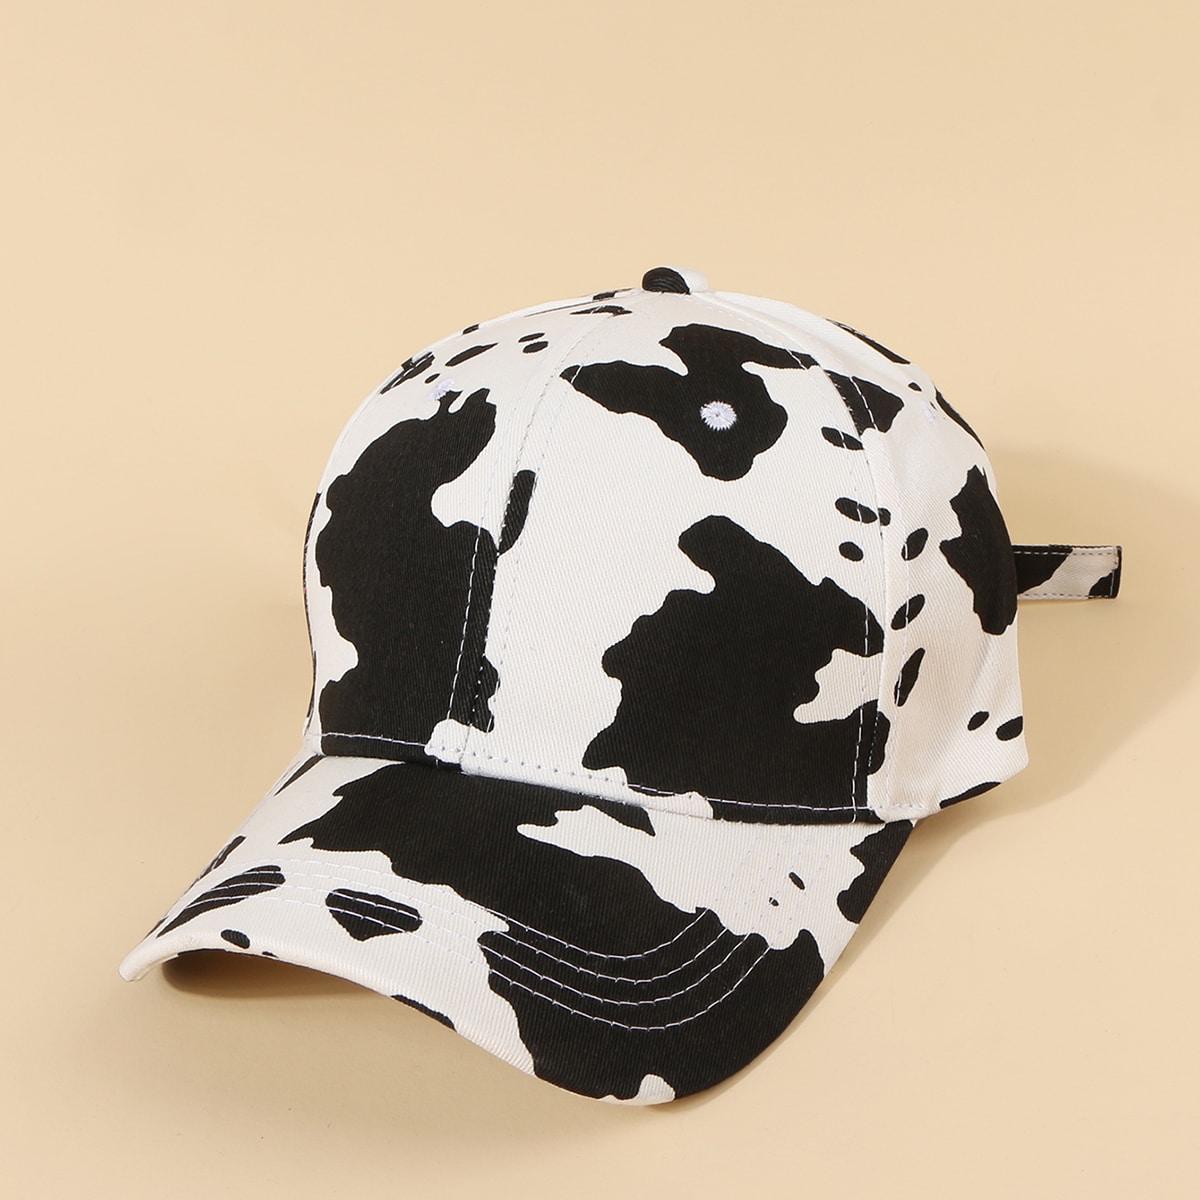 Männer Baseball Kappe mit Kuh Muster